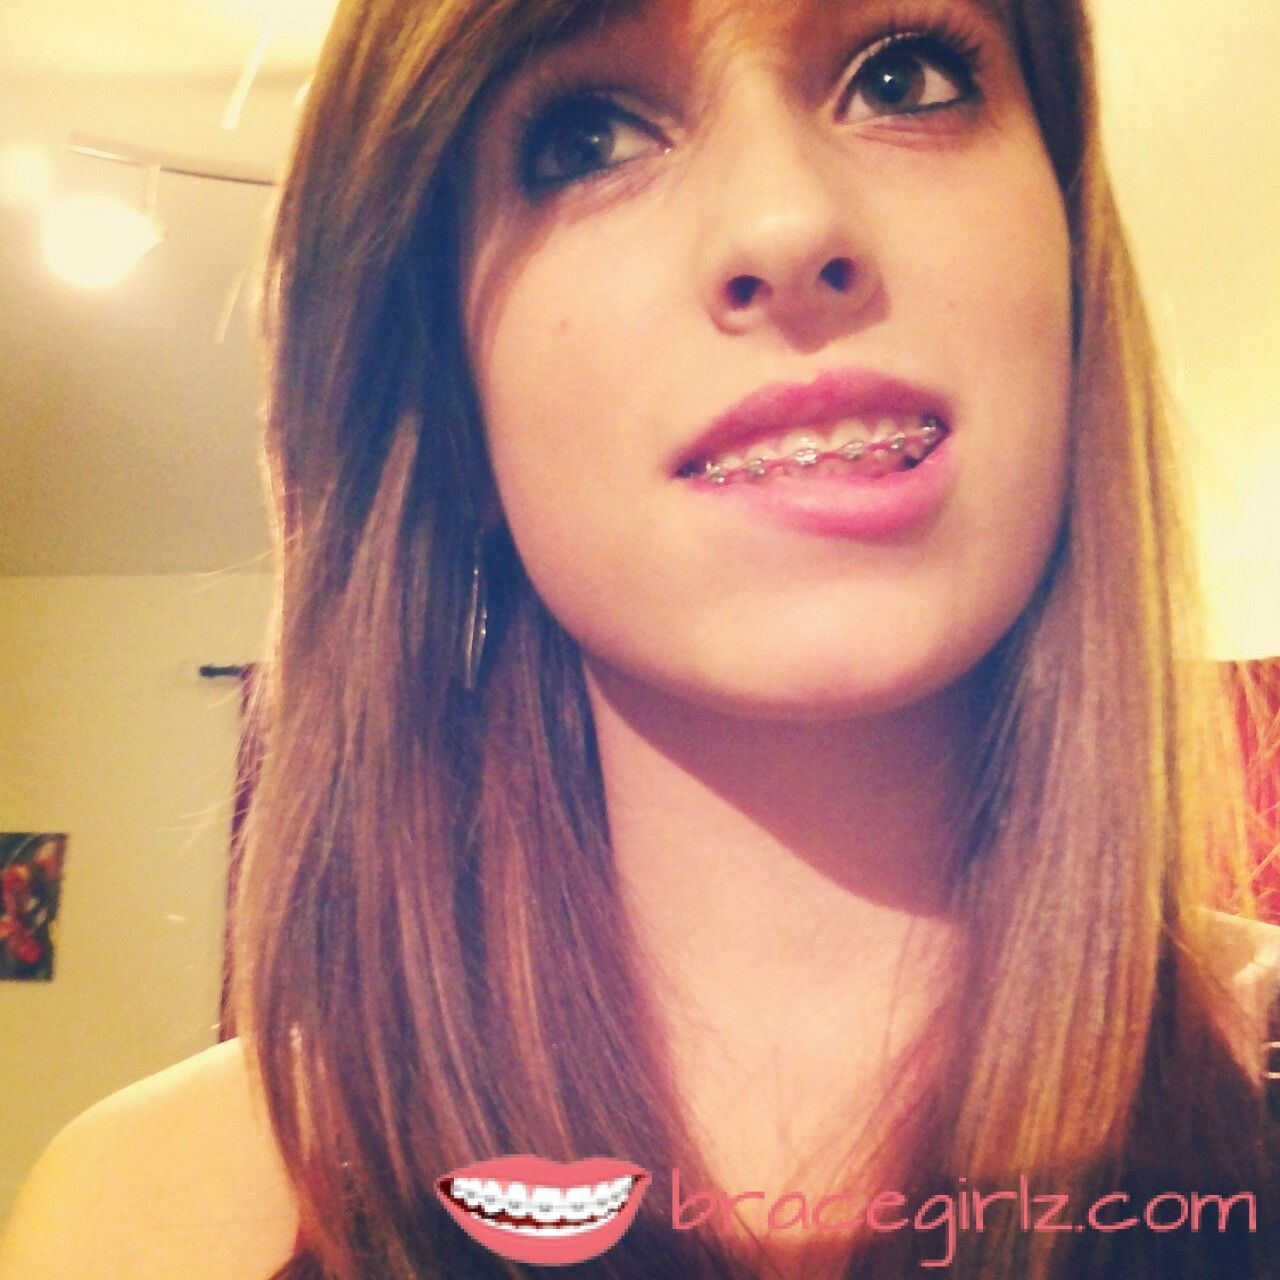 Skinny teen girls with braces